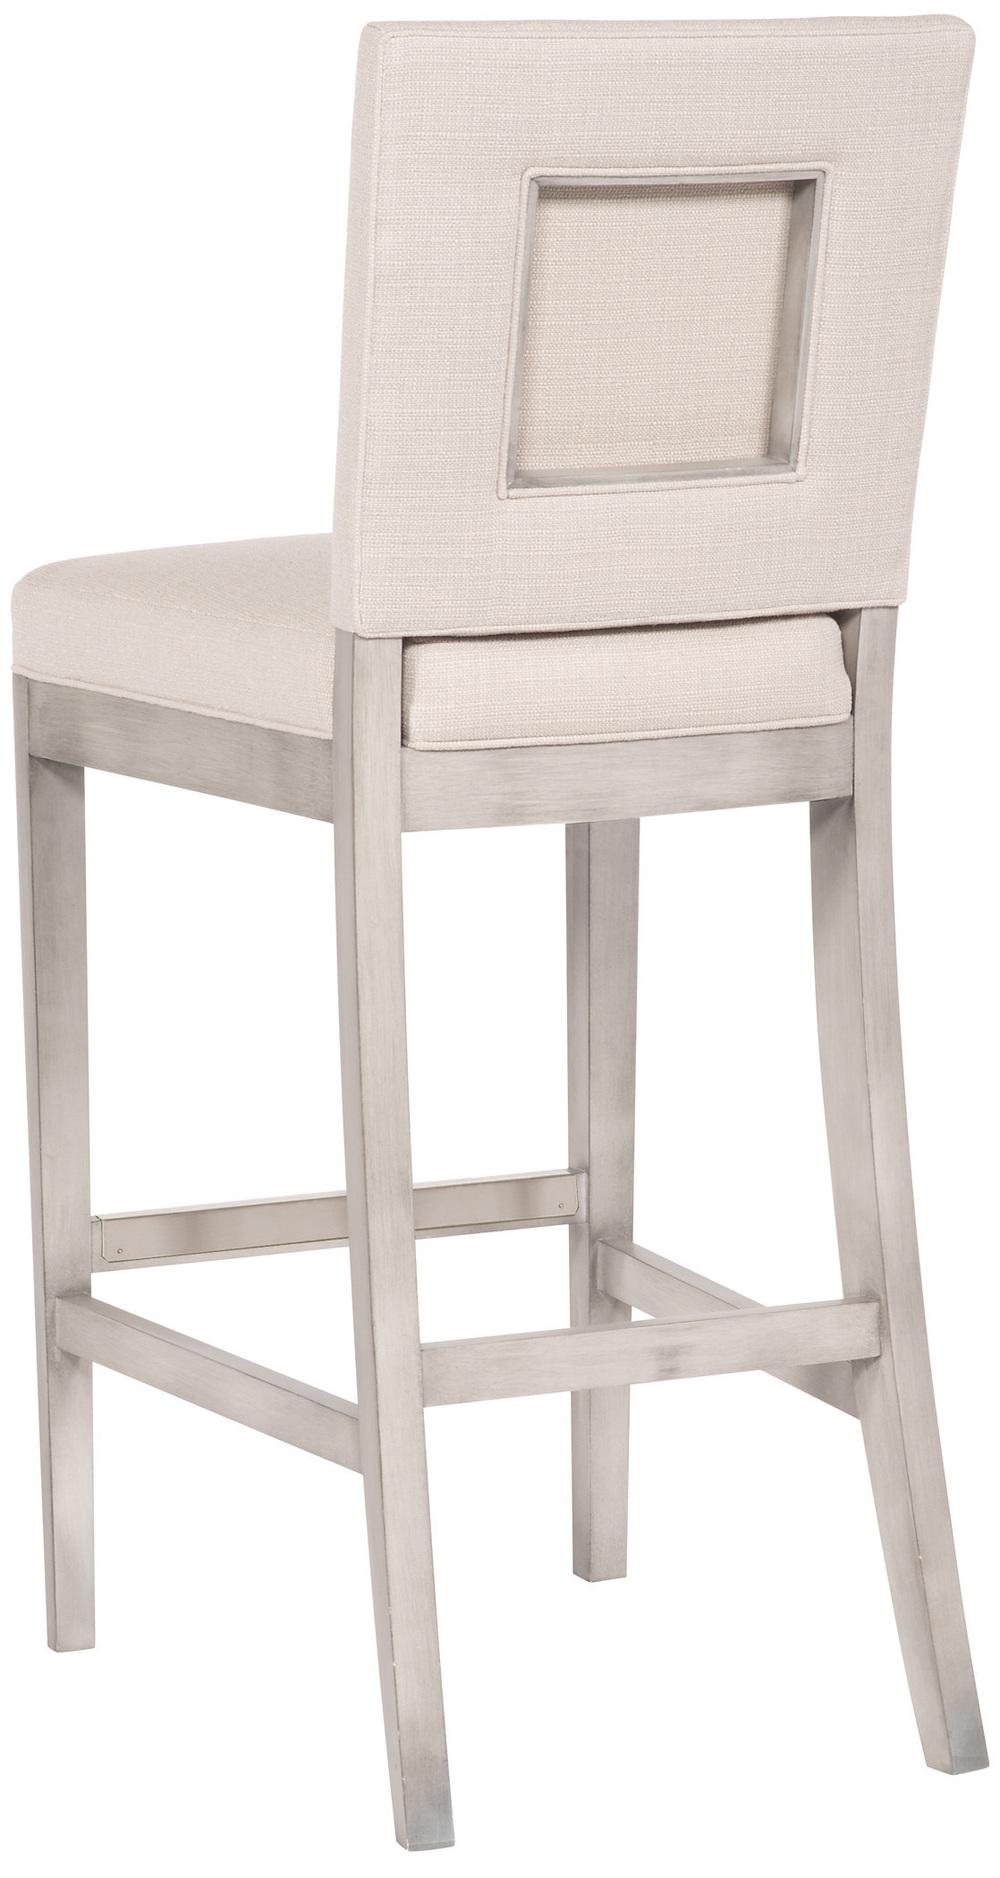 Vanguard Furniture - Juliet Bar Stool